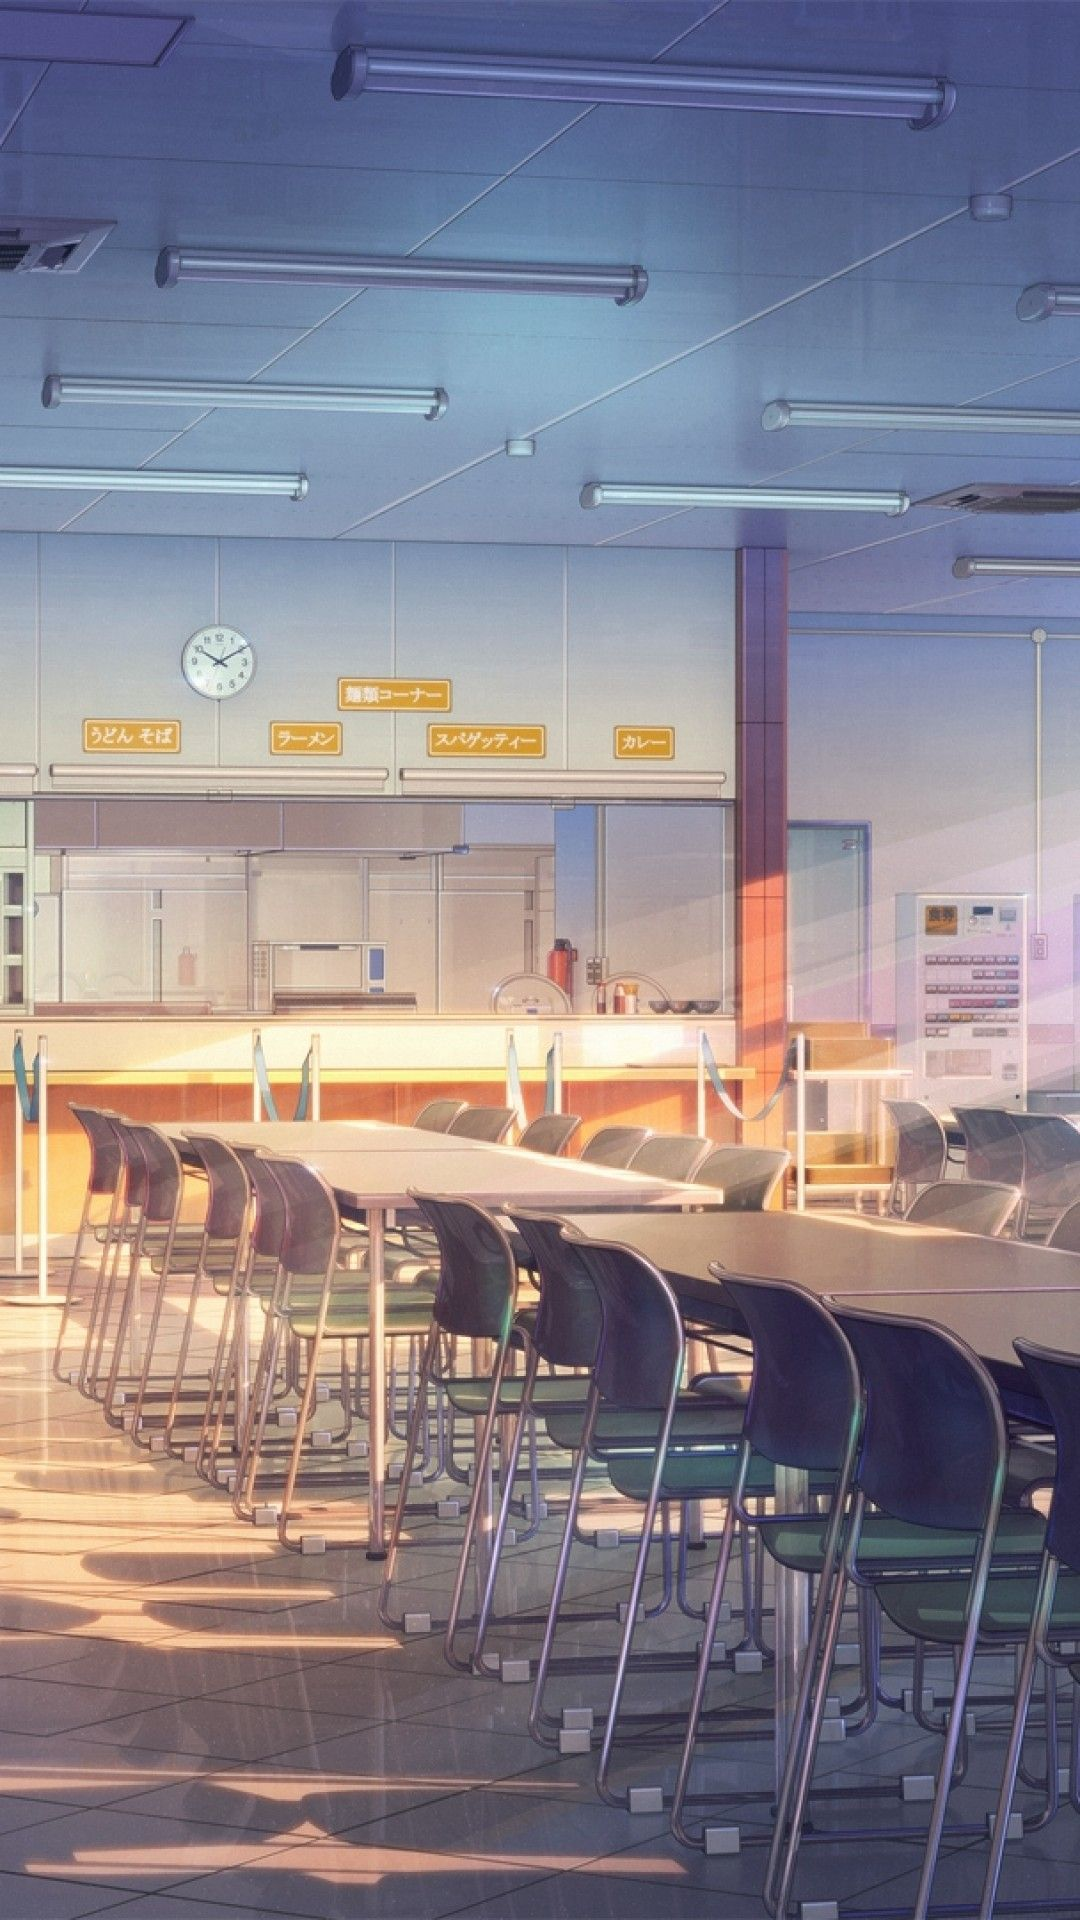 anime building school cafeteria windows artwork